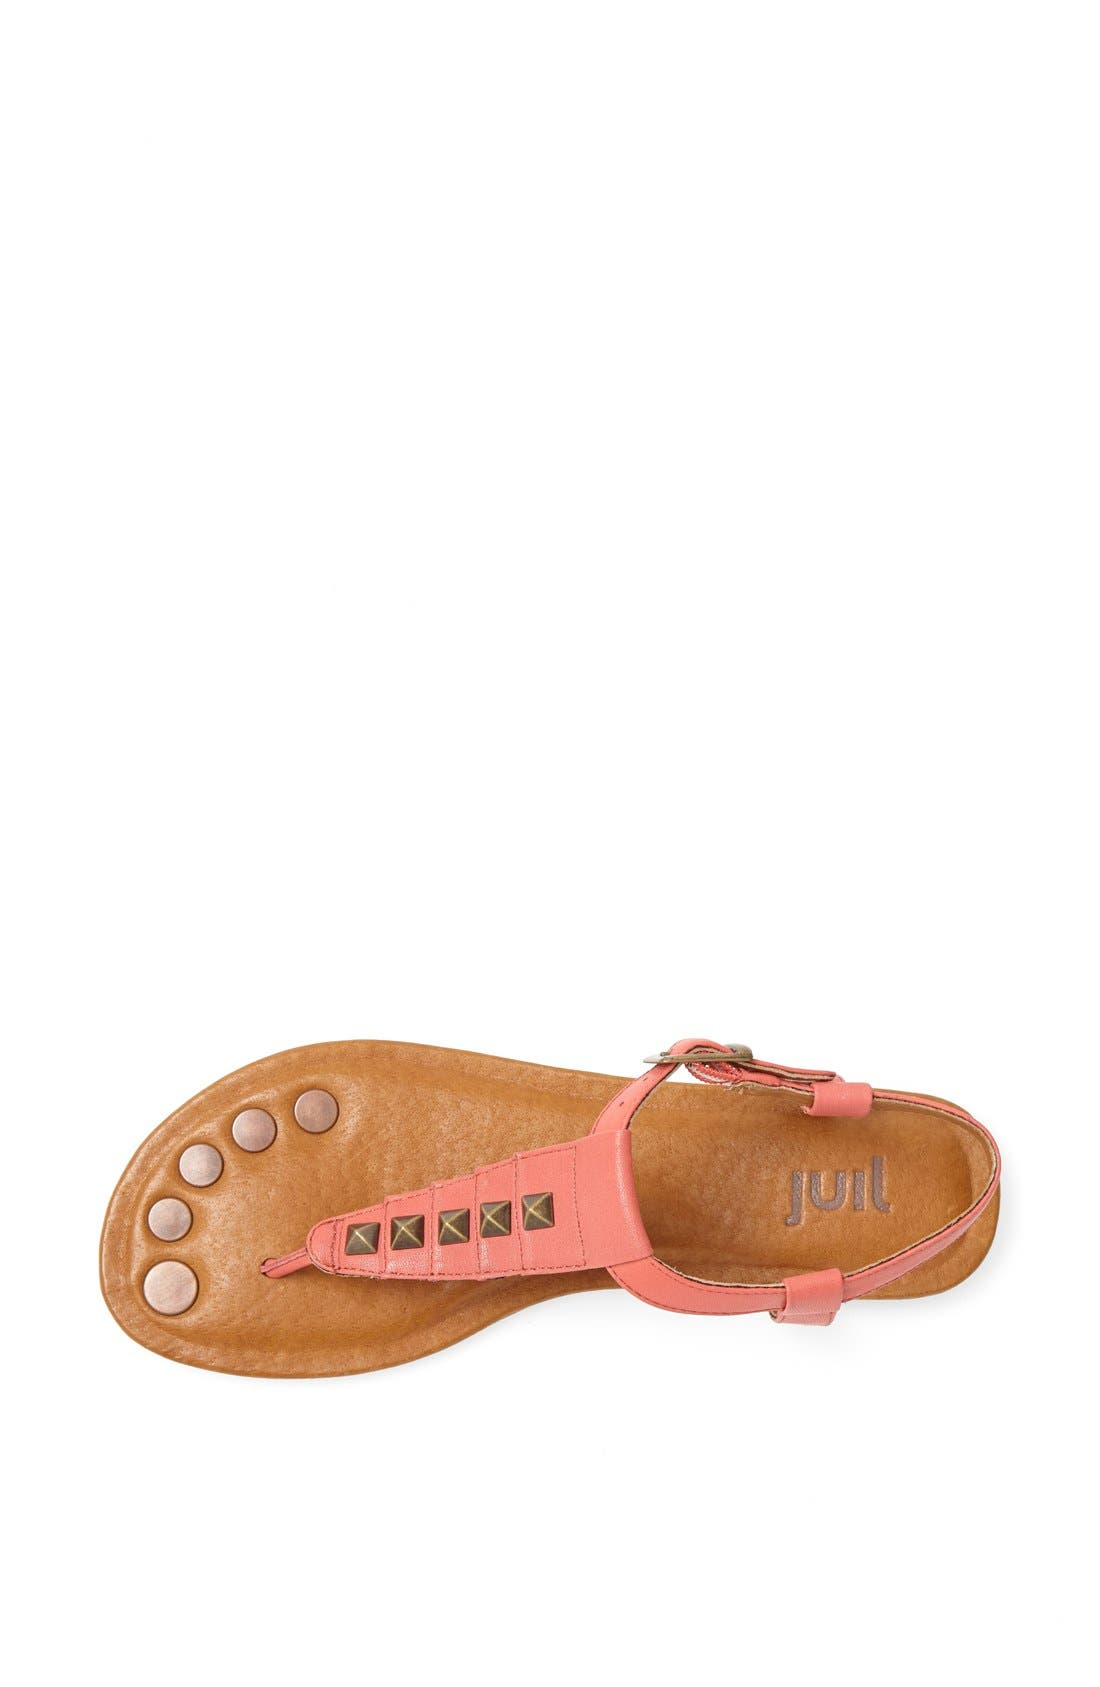 Alternate Image 3  - Juil 'Kava' Grounded Leather Sandal